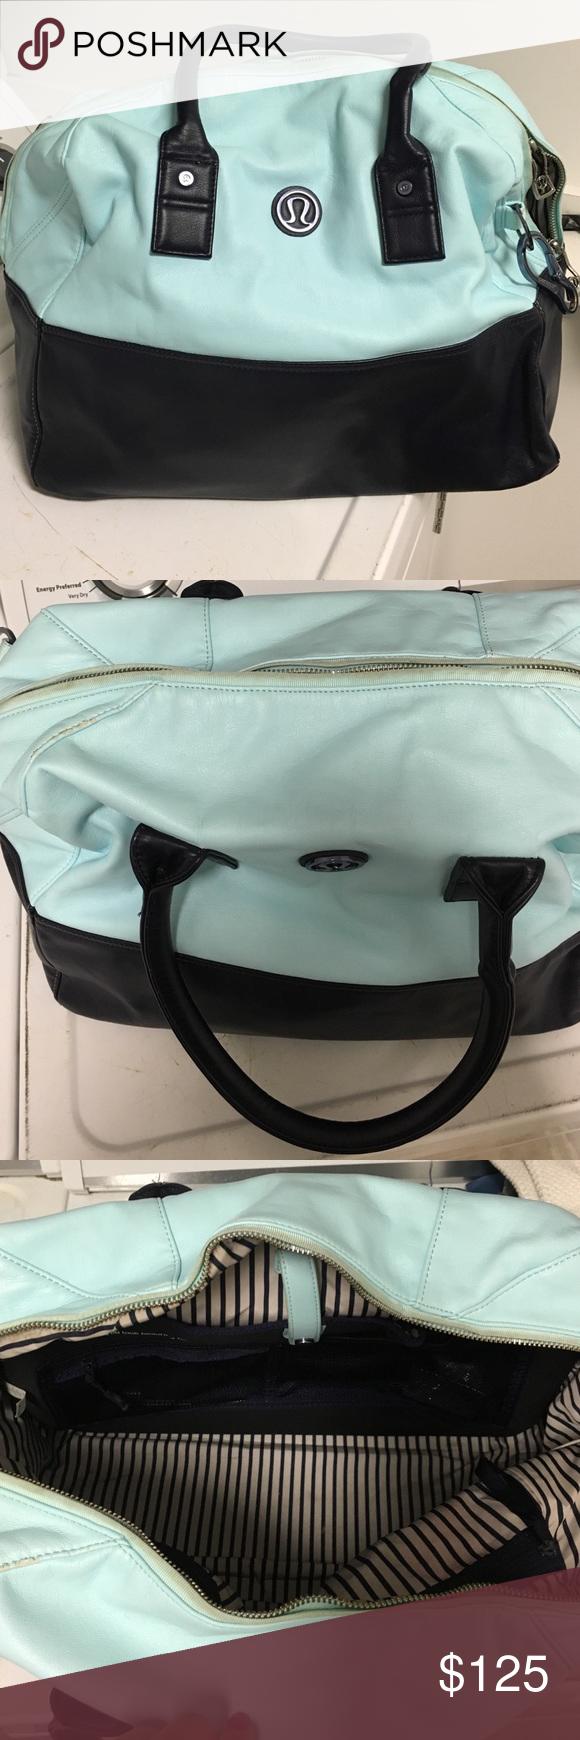 cece2f9f5c Lululemon Gym Bag Lululemon gym bag. Mint green and navy blue ...